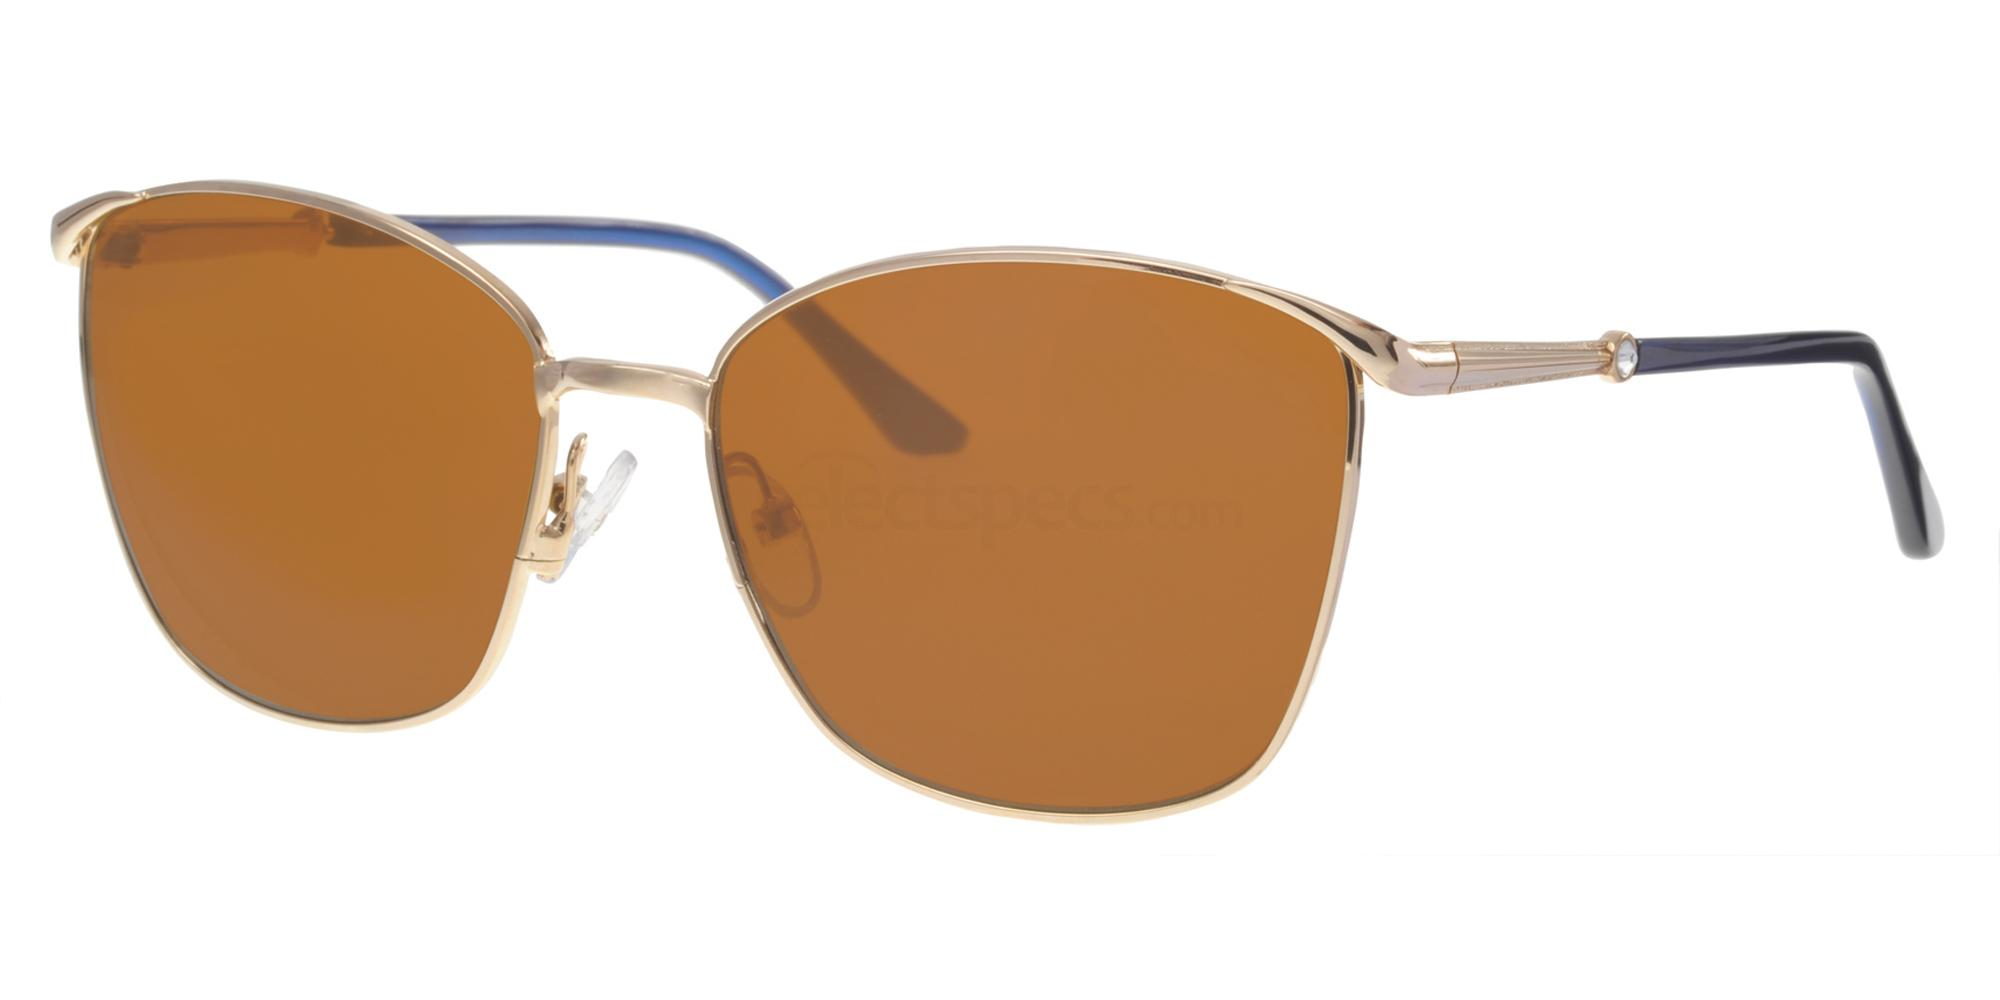 C01 3010 Sunglasses, Joia